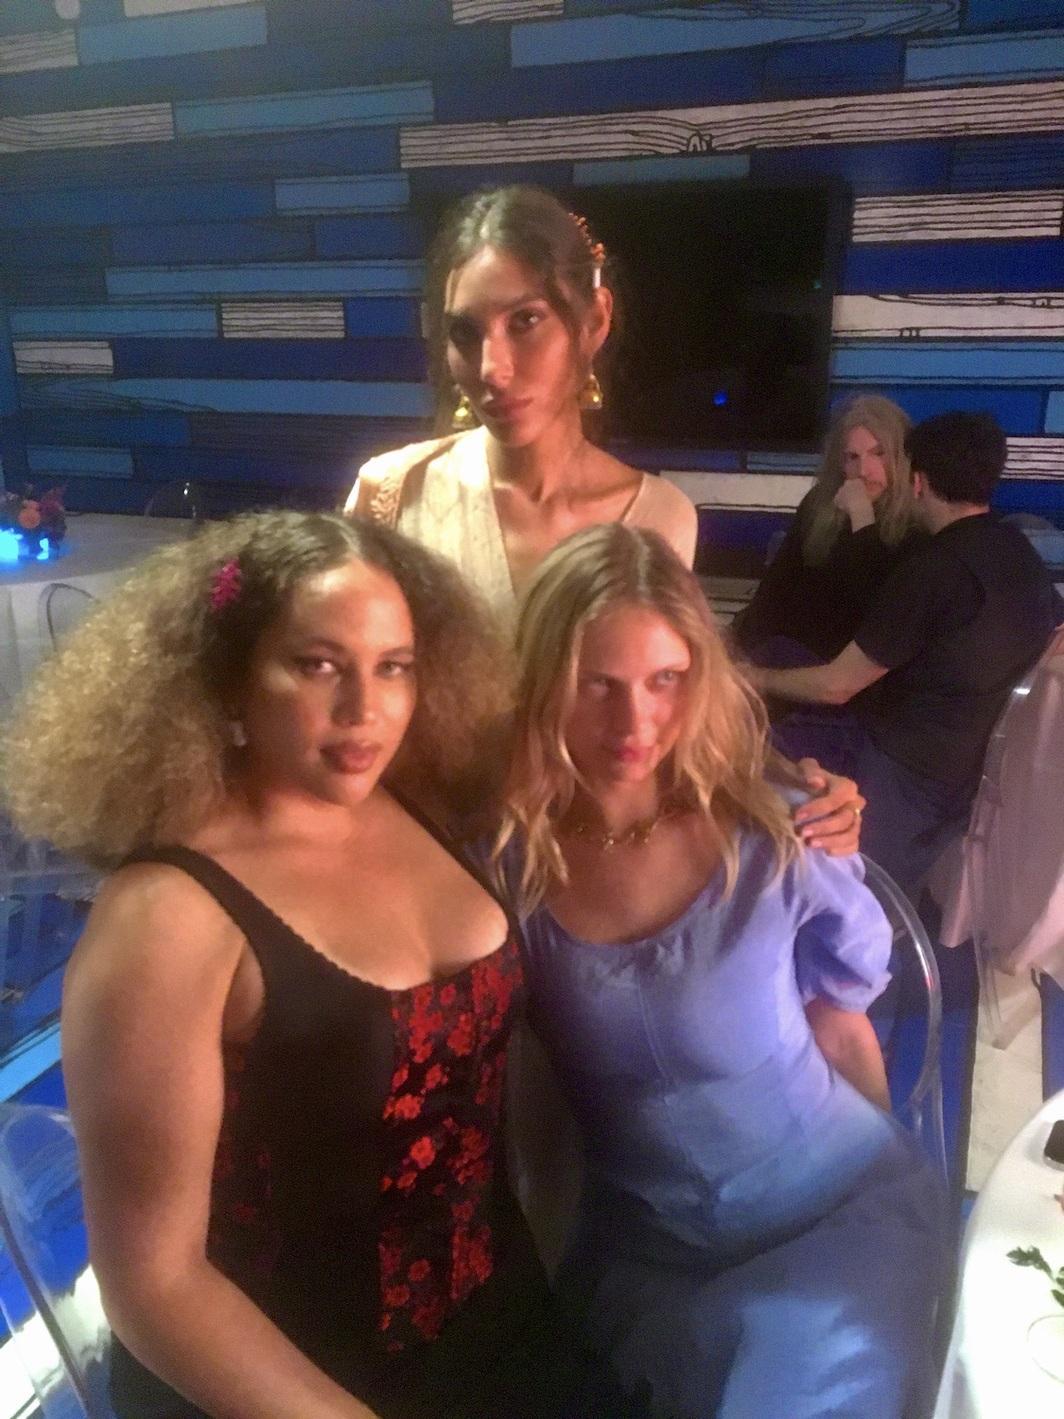 Models Matisse Andrews, Delilah Summer, and Leila Rahimi. Photo: Chloe Wyma.